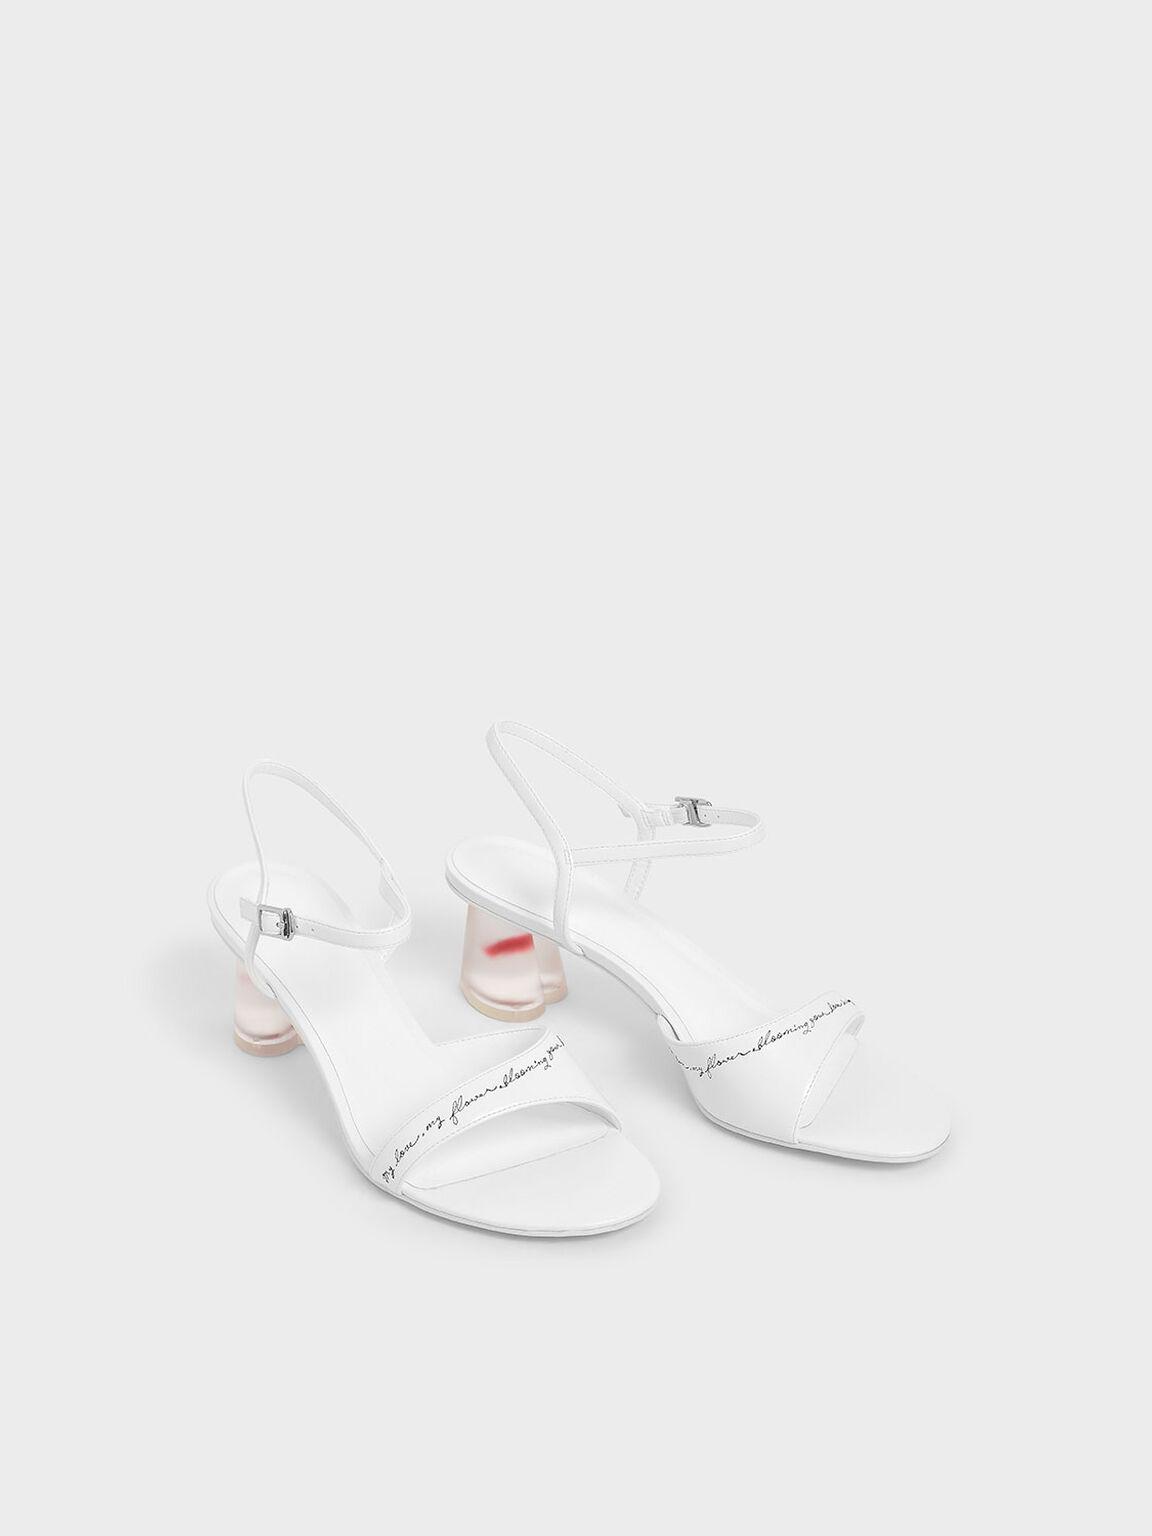 Embroidered Lucite Sculptural Heel Sandals, White, hi-res